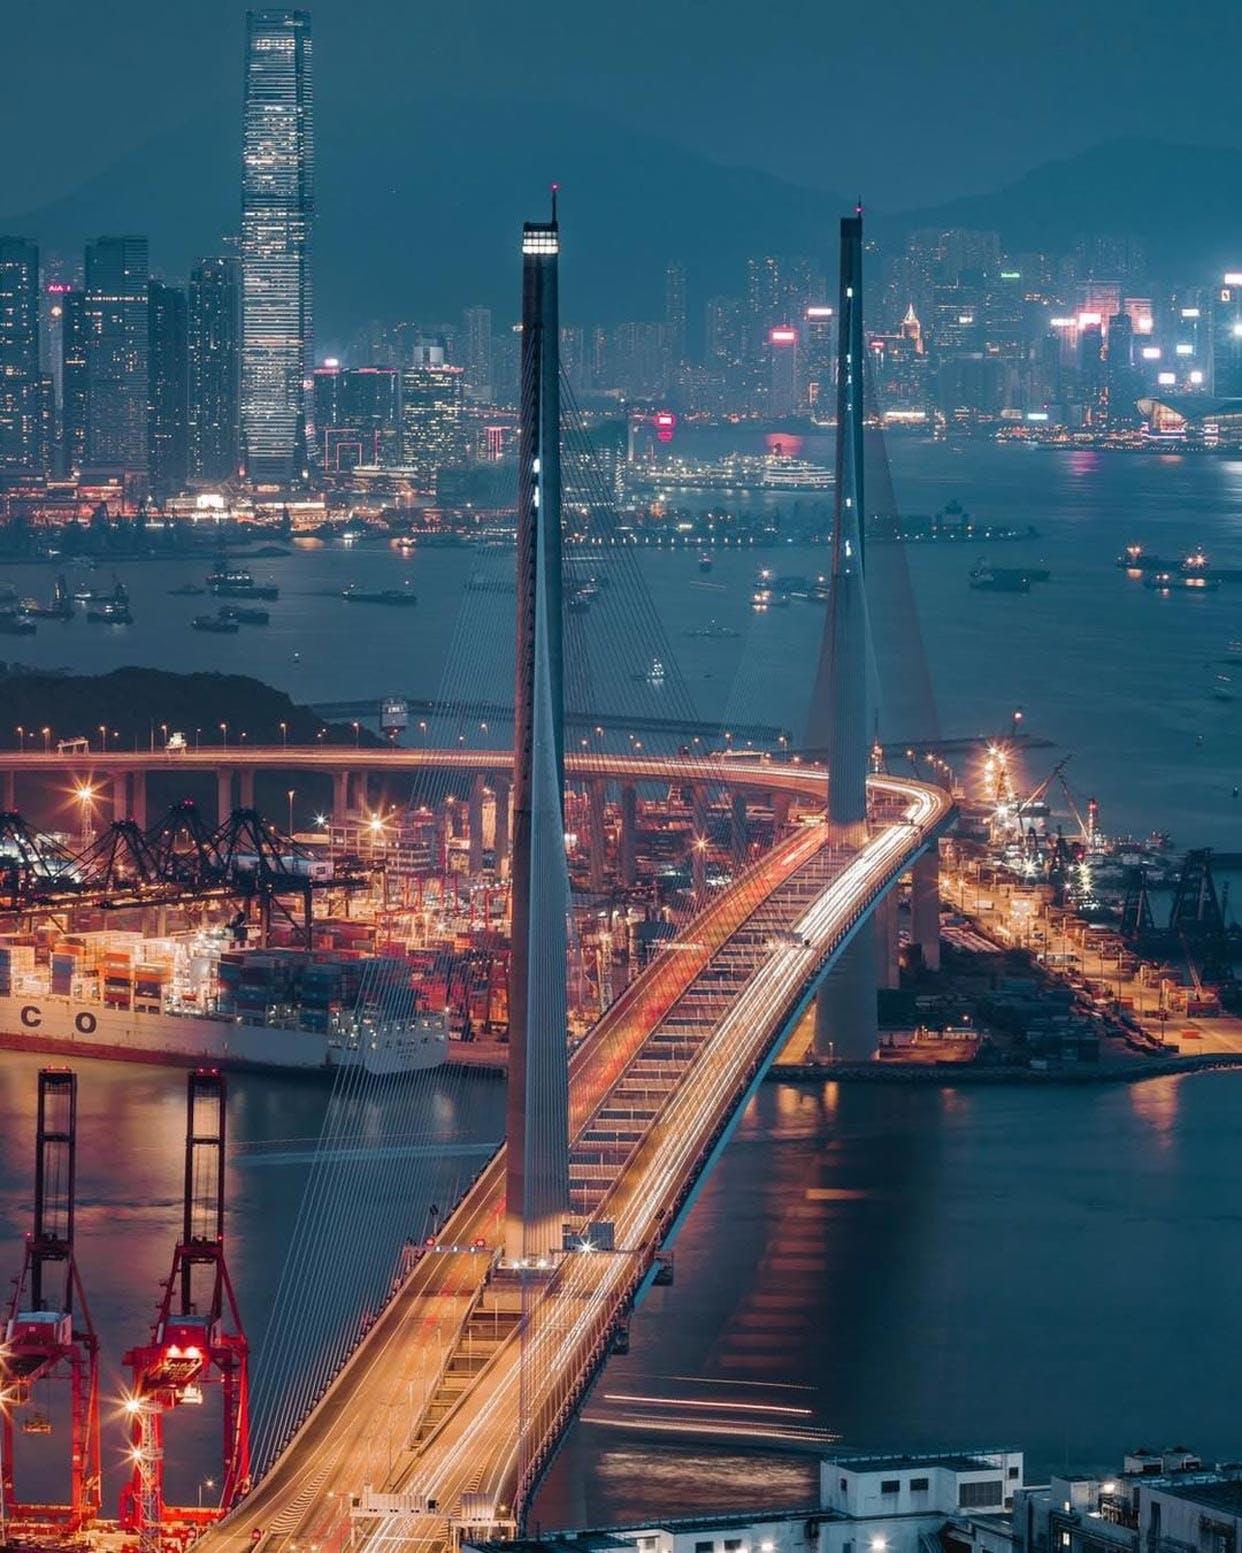 Tsing Yi Island Peak view of Stonecutters Bridge & ICC Building